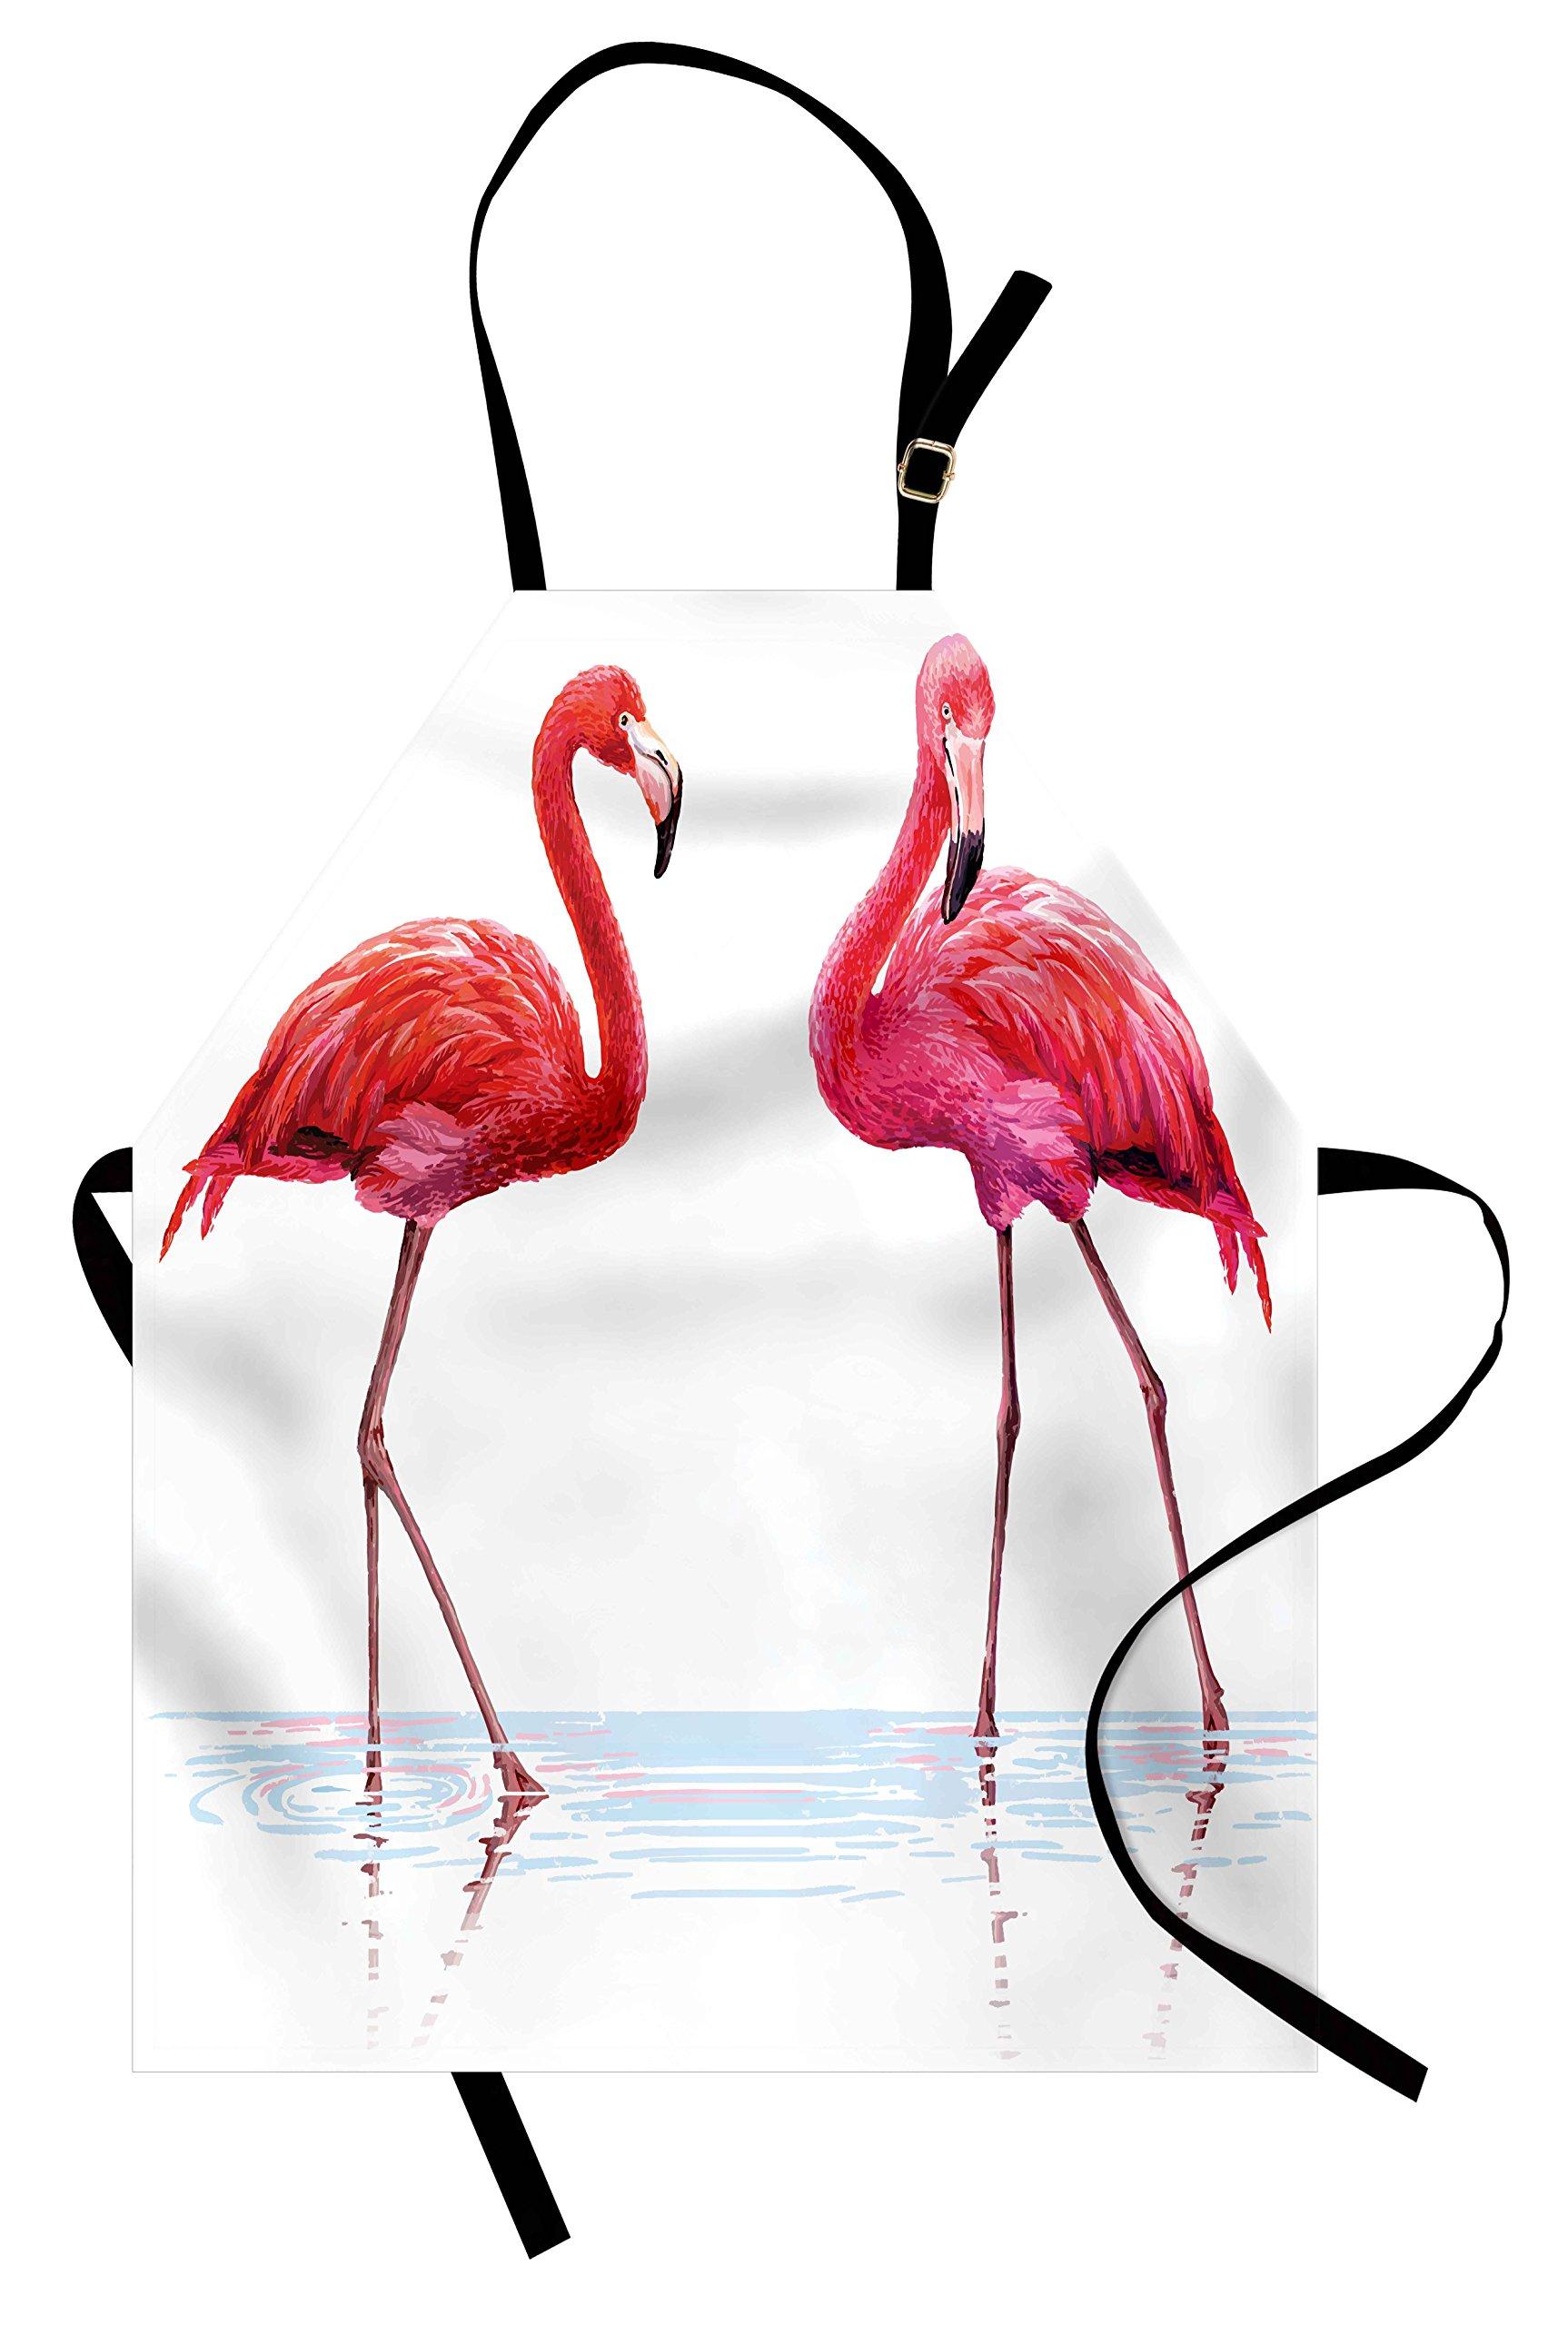 Ambesonne Animal Apron, Two Hand Drawn Flamingos in Pink Colors on Seaside Tropical Wildlife Artwork, Unisex Kitchen Bib Apron with Adjustable Neck for Cooking Baking Gardening, Orange Lavander